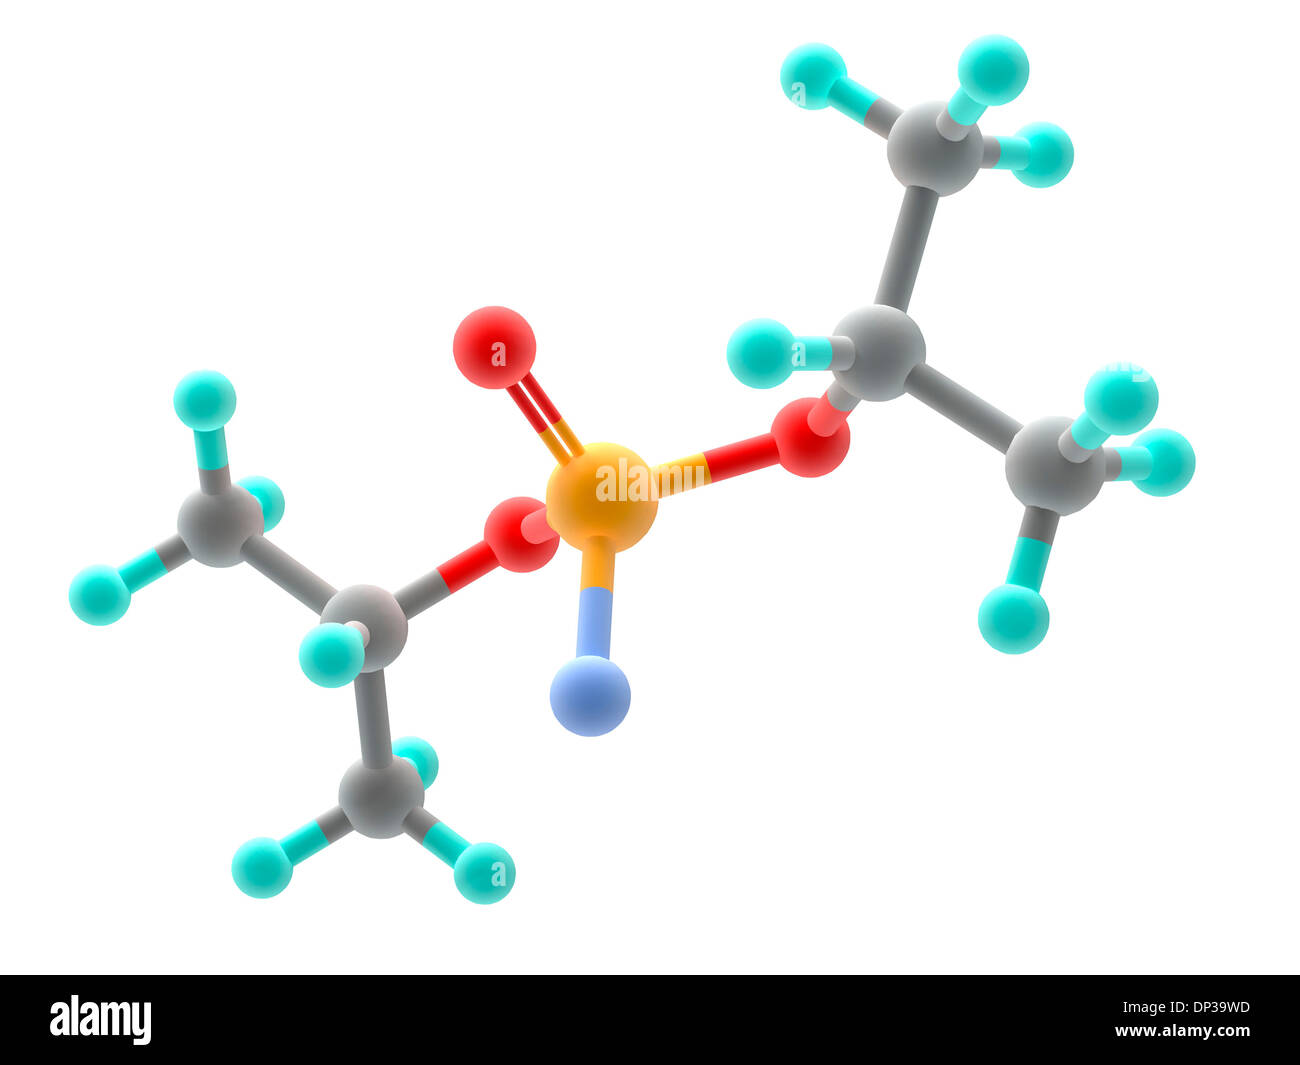 Sarin nerve gas molecule - Stock Image